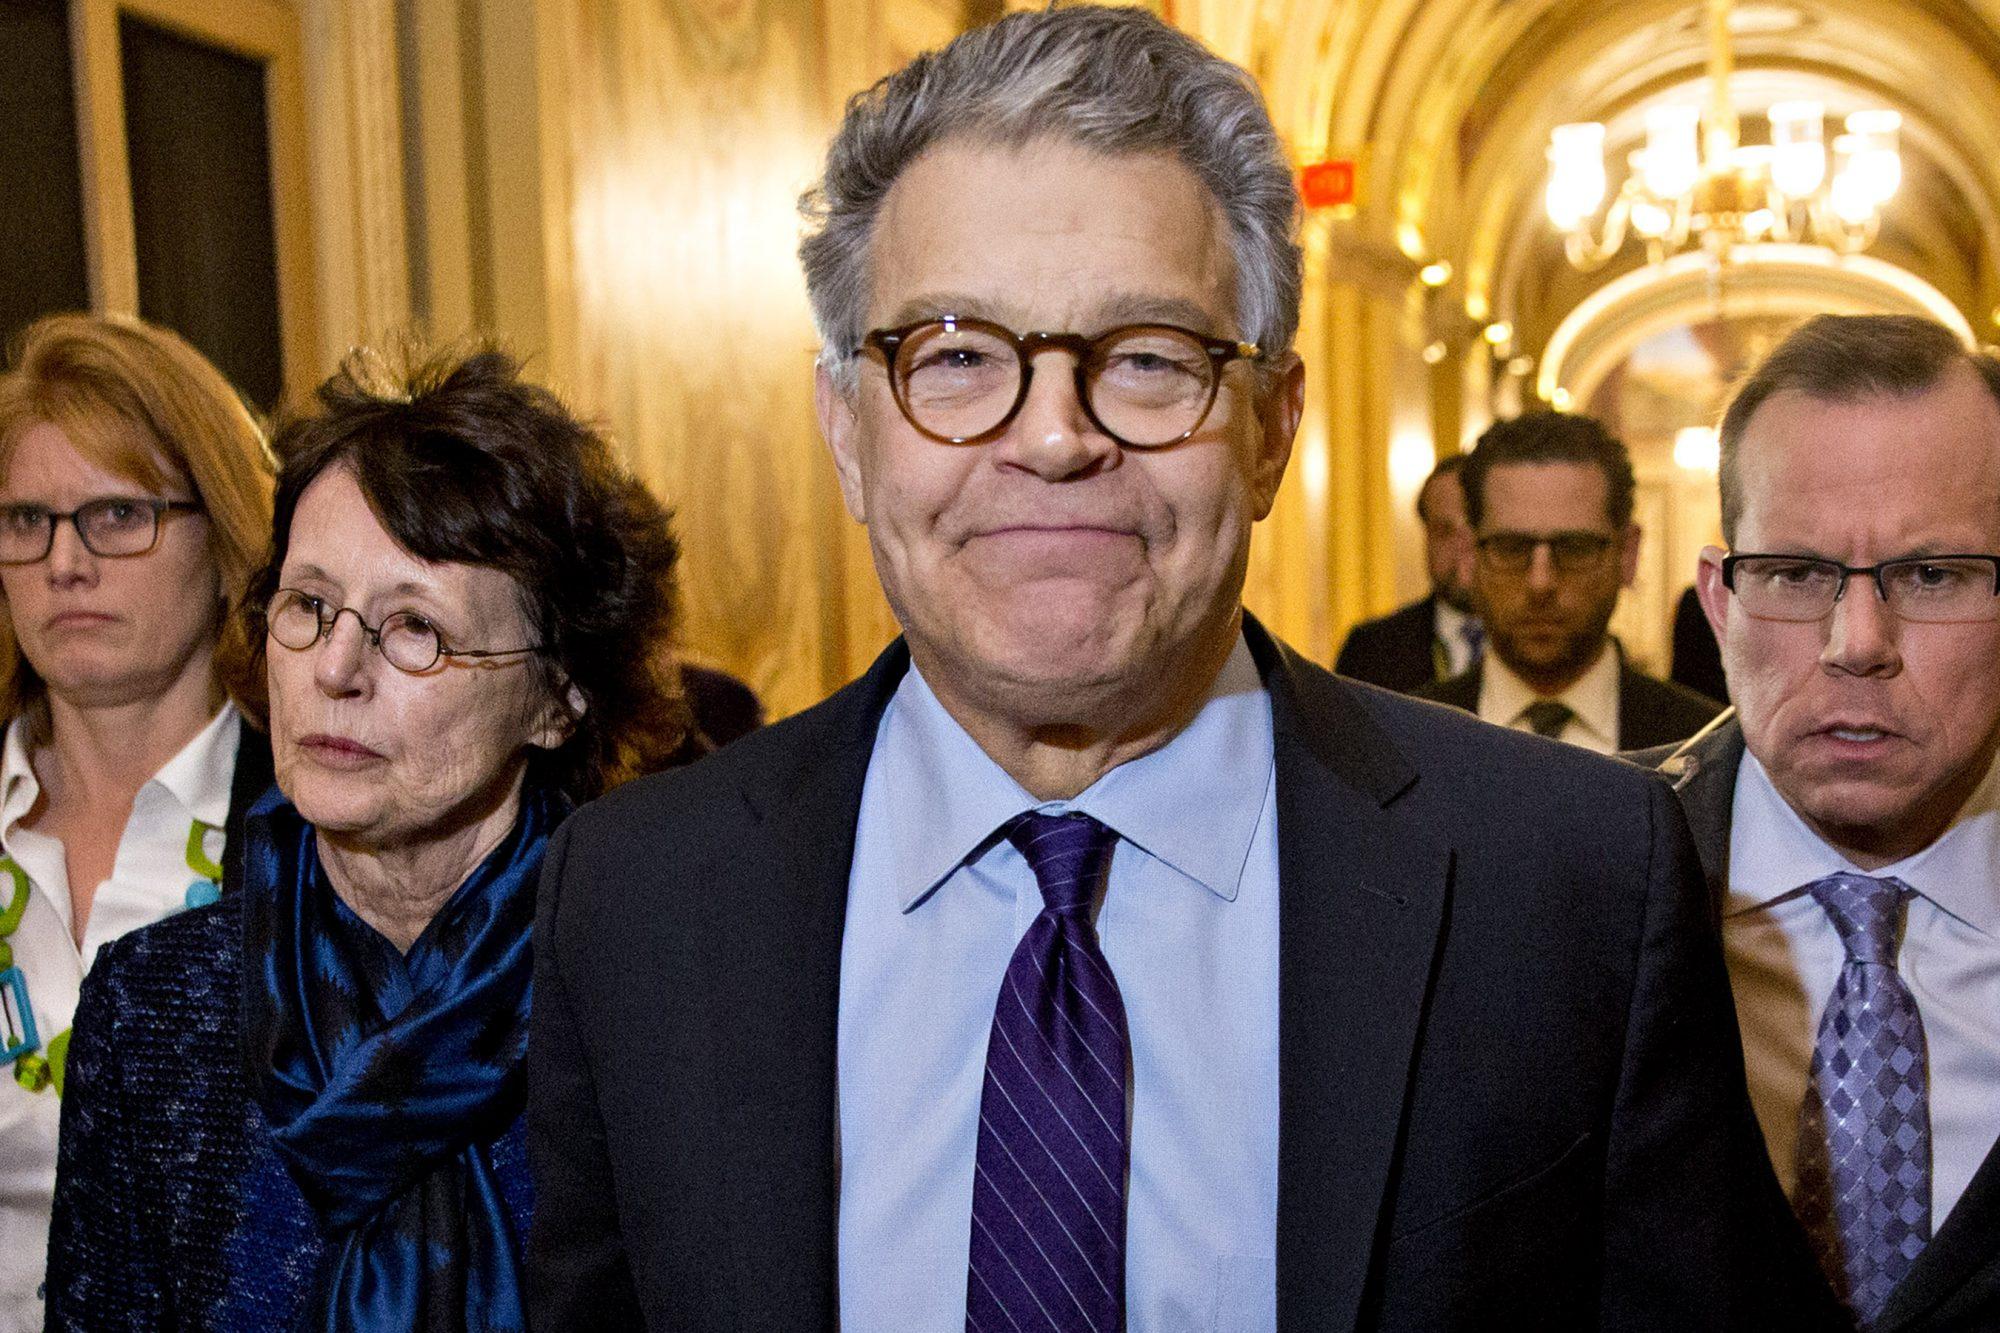 Senator Franken Quits Senate Amid Turmoil Over Misconduct Allegations